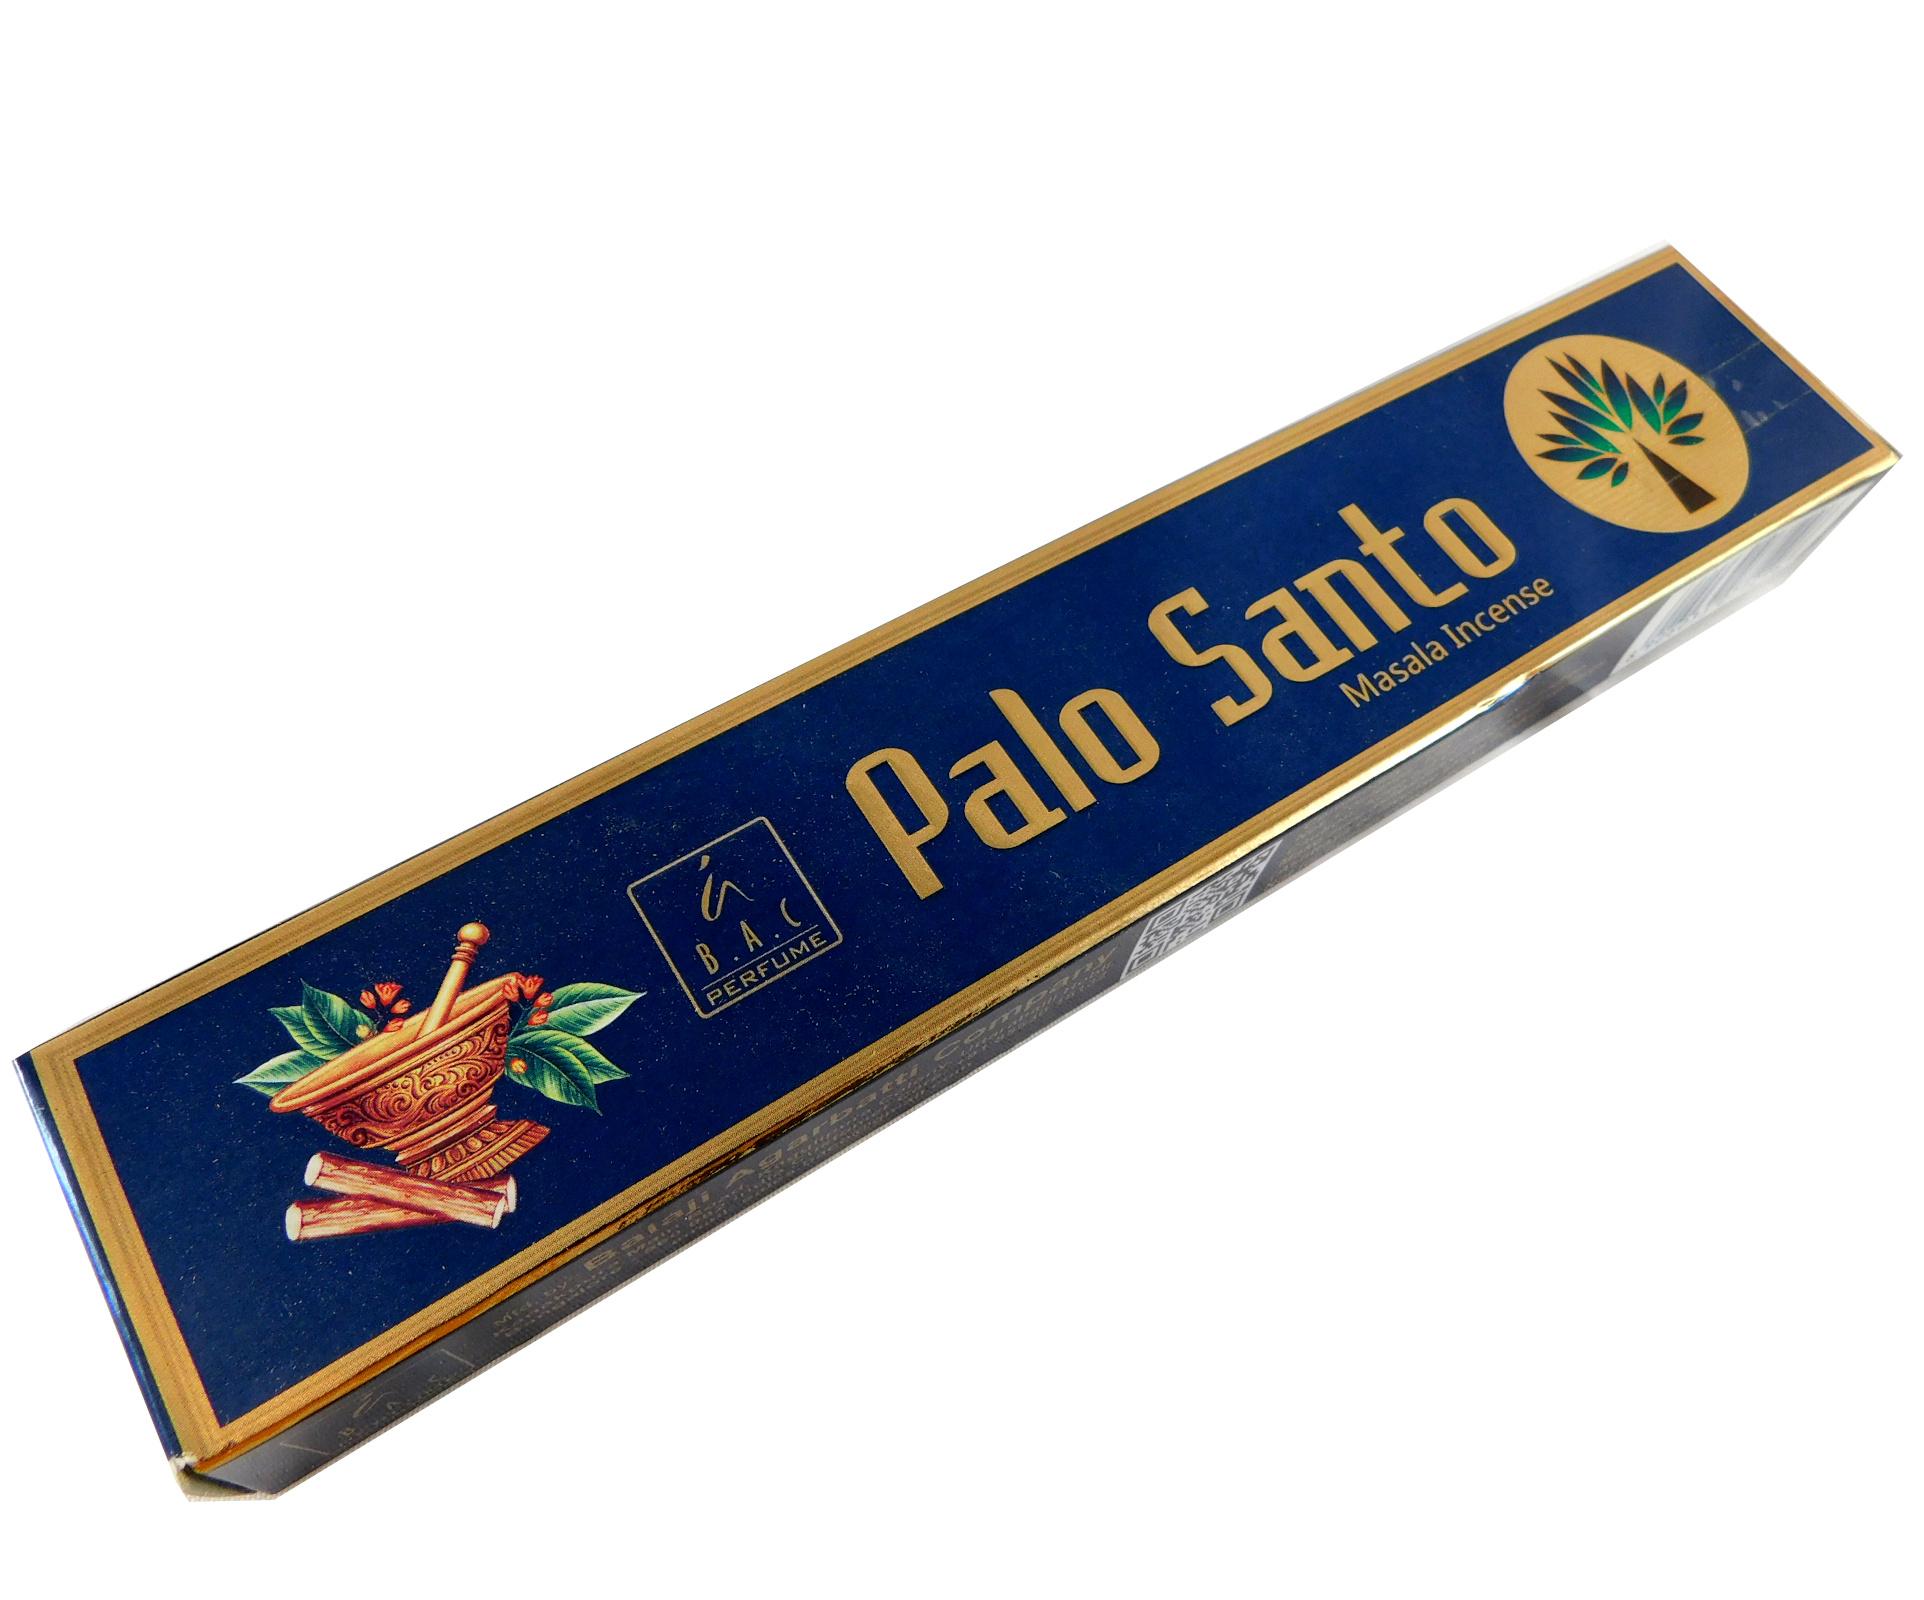 Räucherstäbchen Balaji Palo Santo 15g Packung. Ca. 15 Incence Sticks